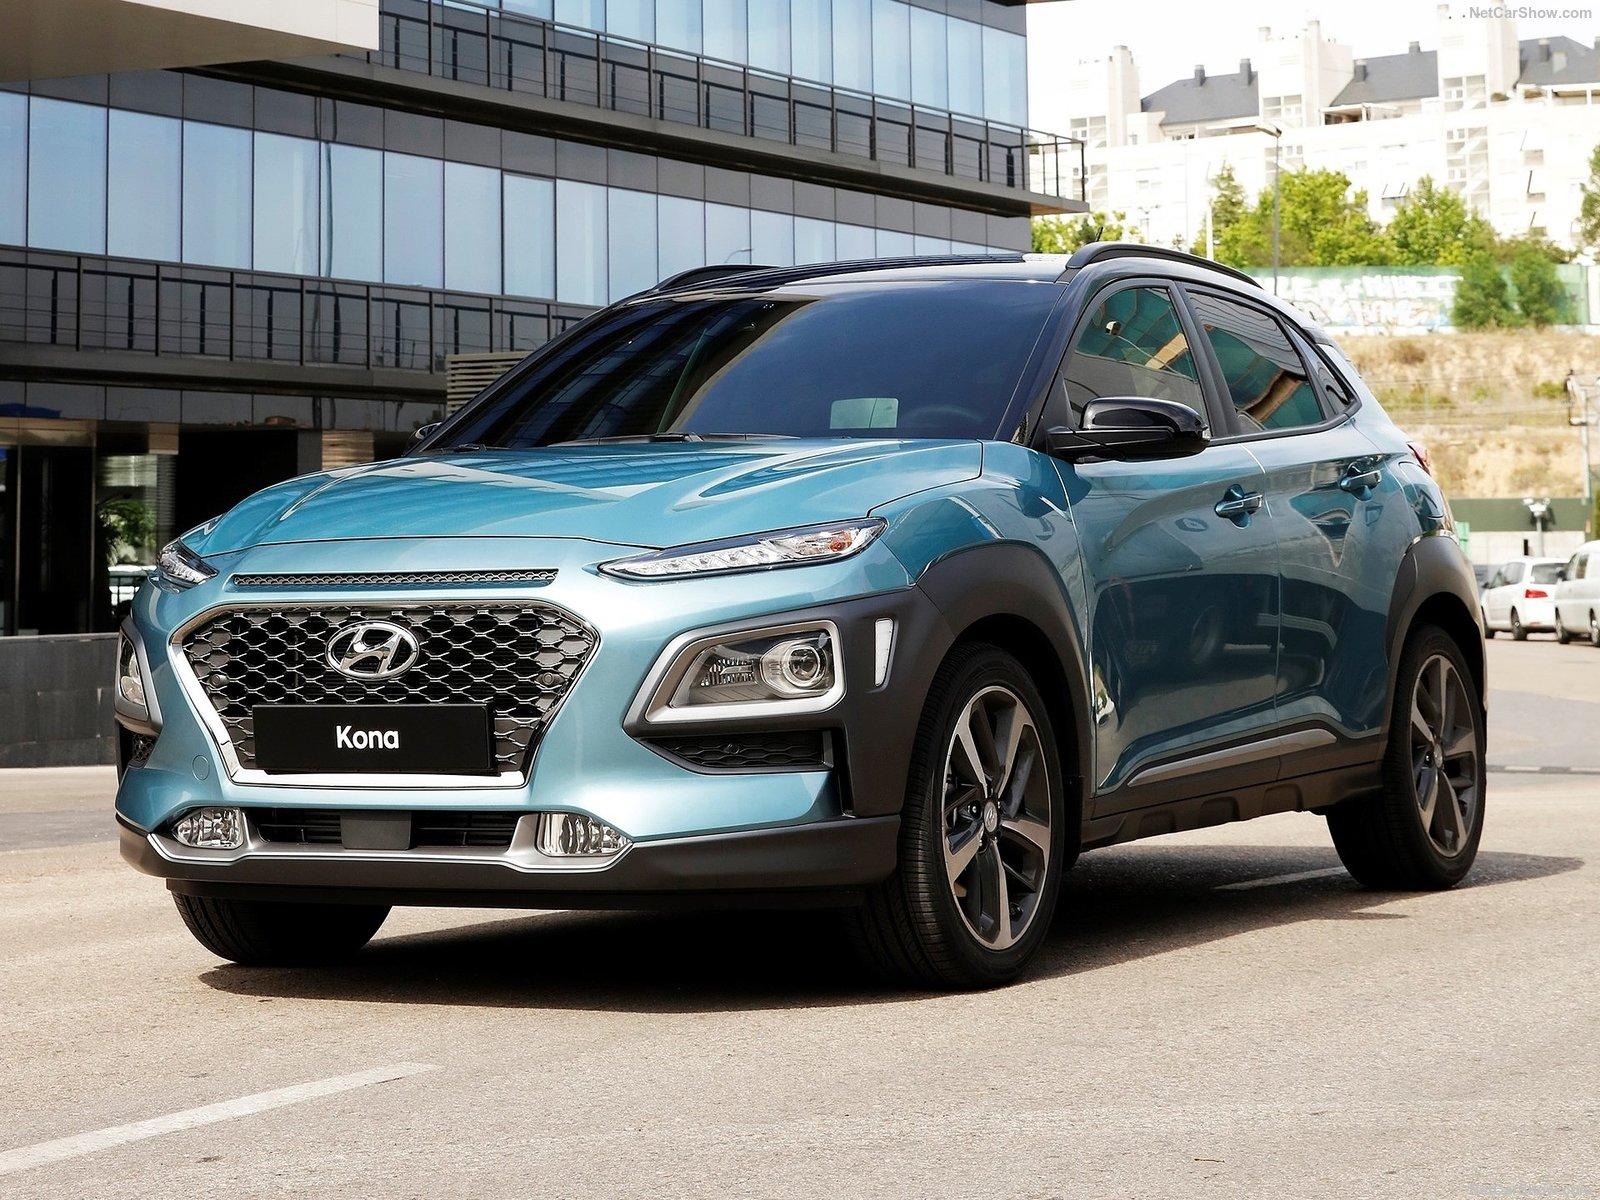 Hyundai Kona 2018: Un vrai SUV avec un caractère progressif